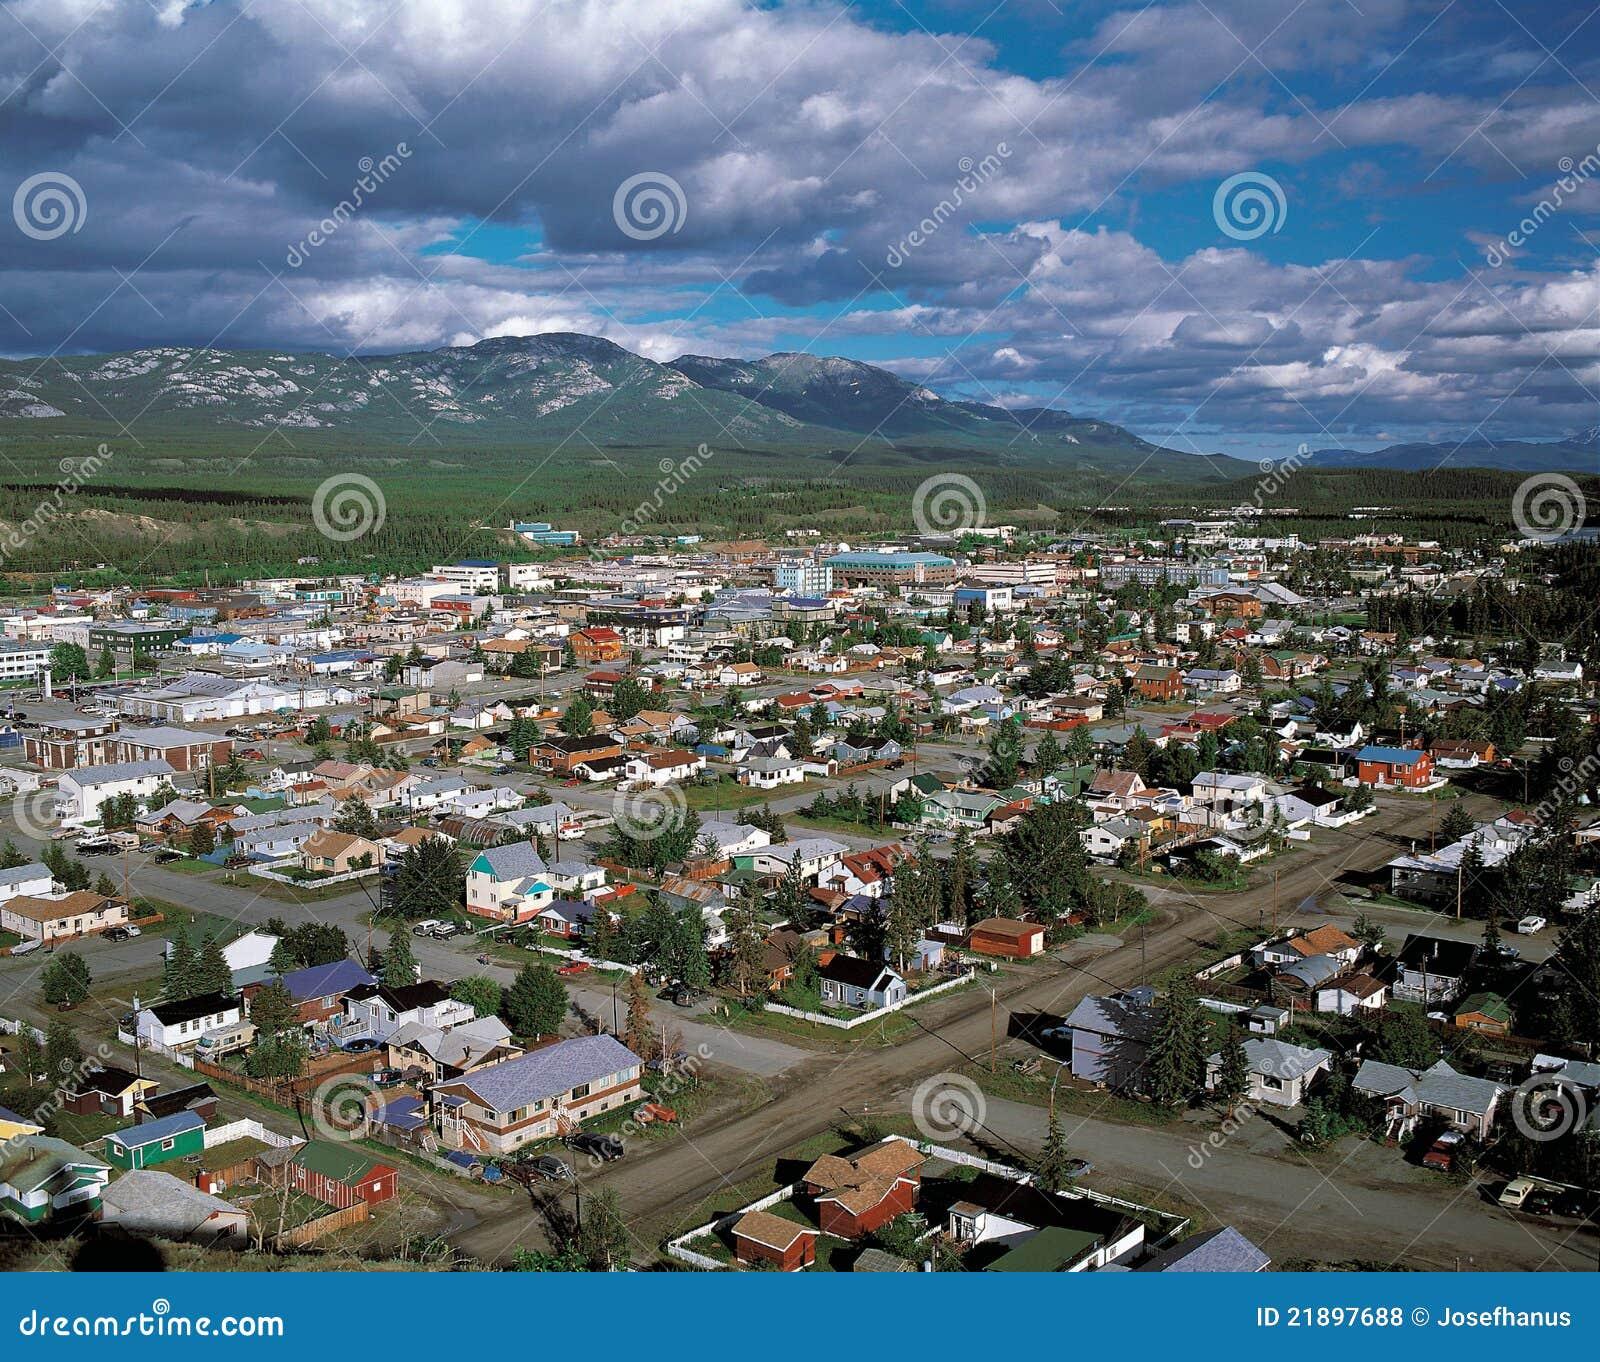 Whitehorse (YT) Canada  City pictures : Whitehorse At Yukon, Canada Royalty Free Stock Photos Image ...